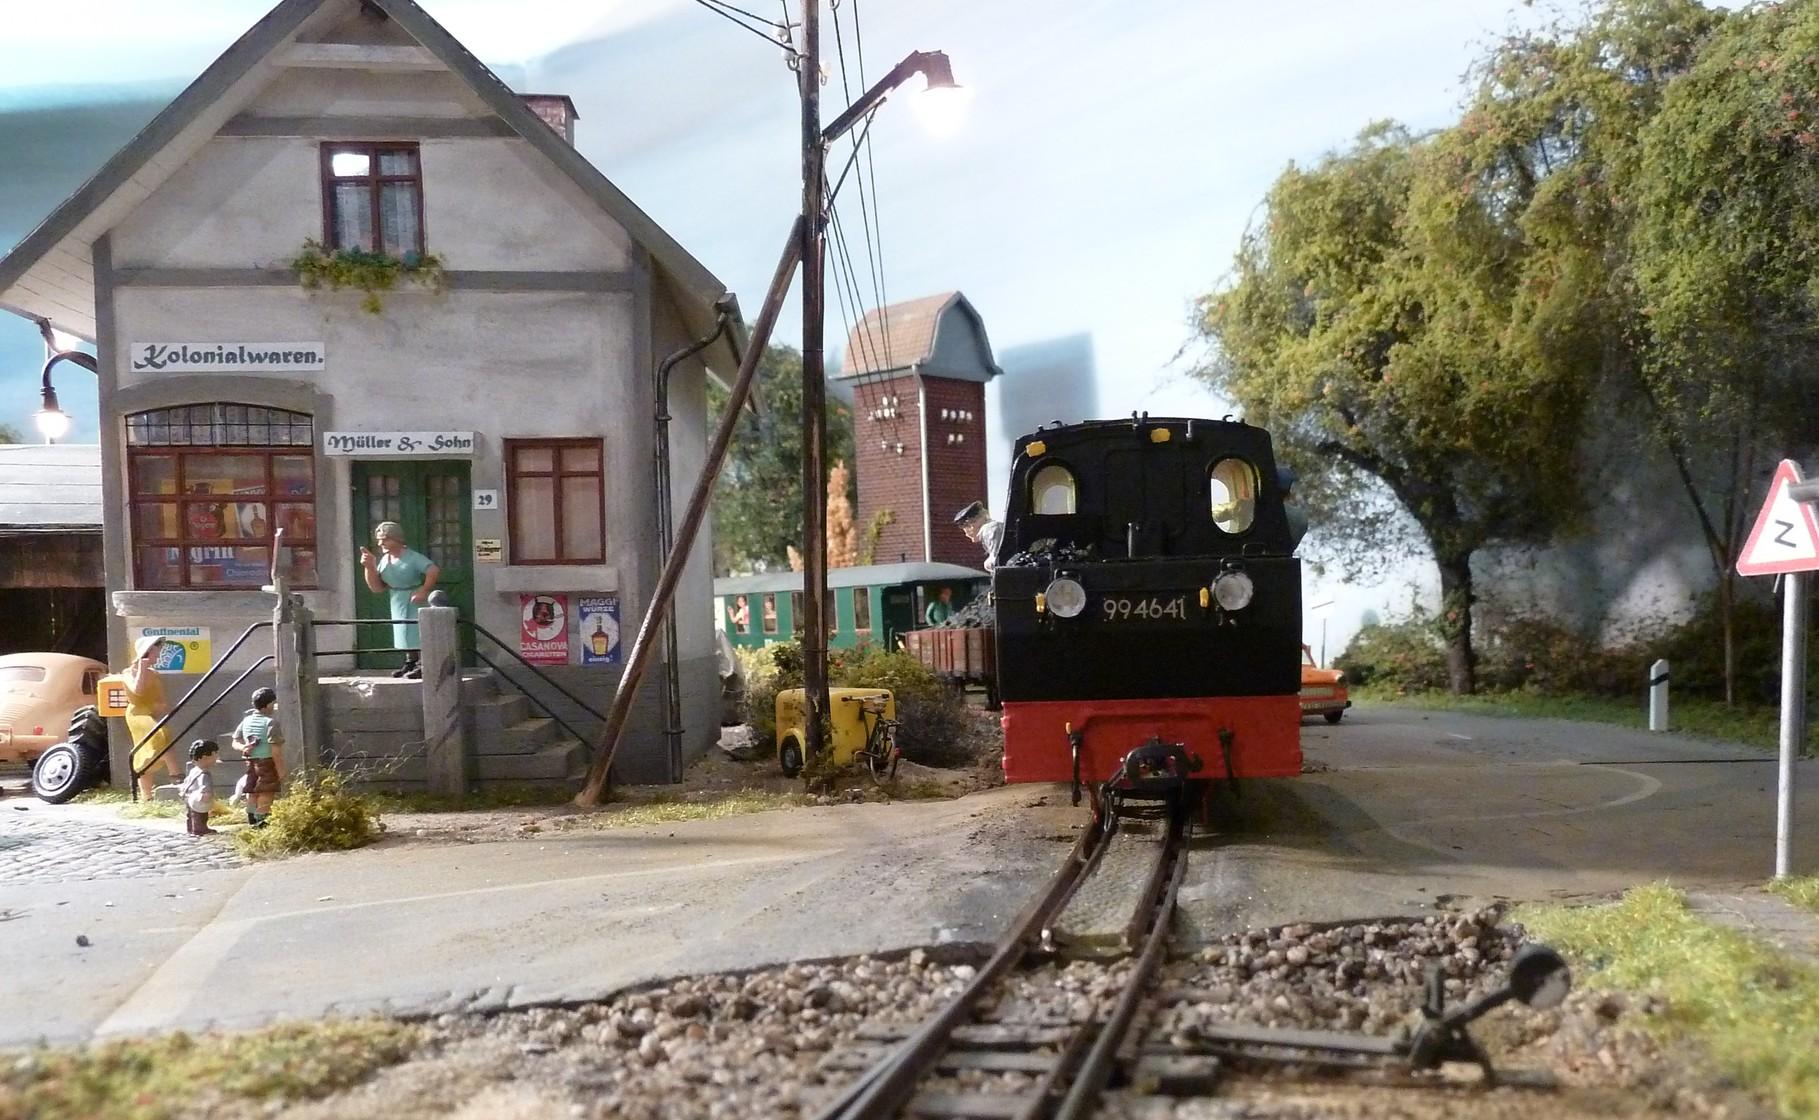 Bahnübergang Weilrode